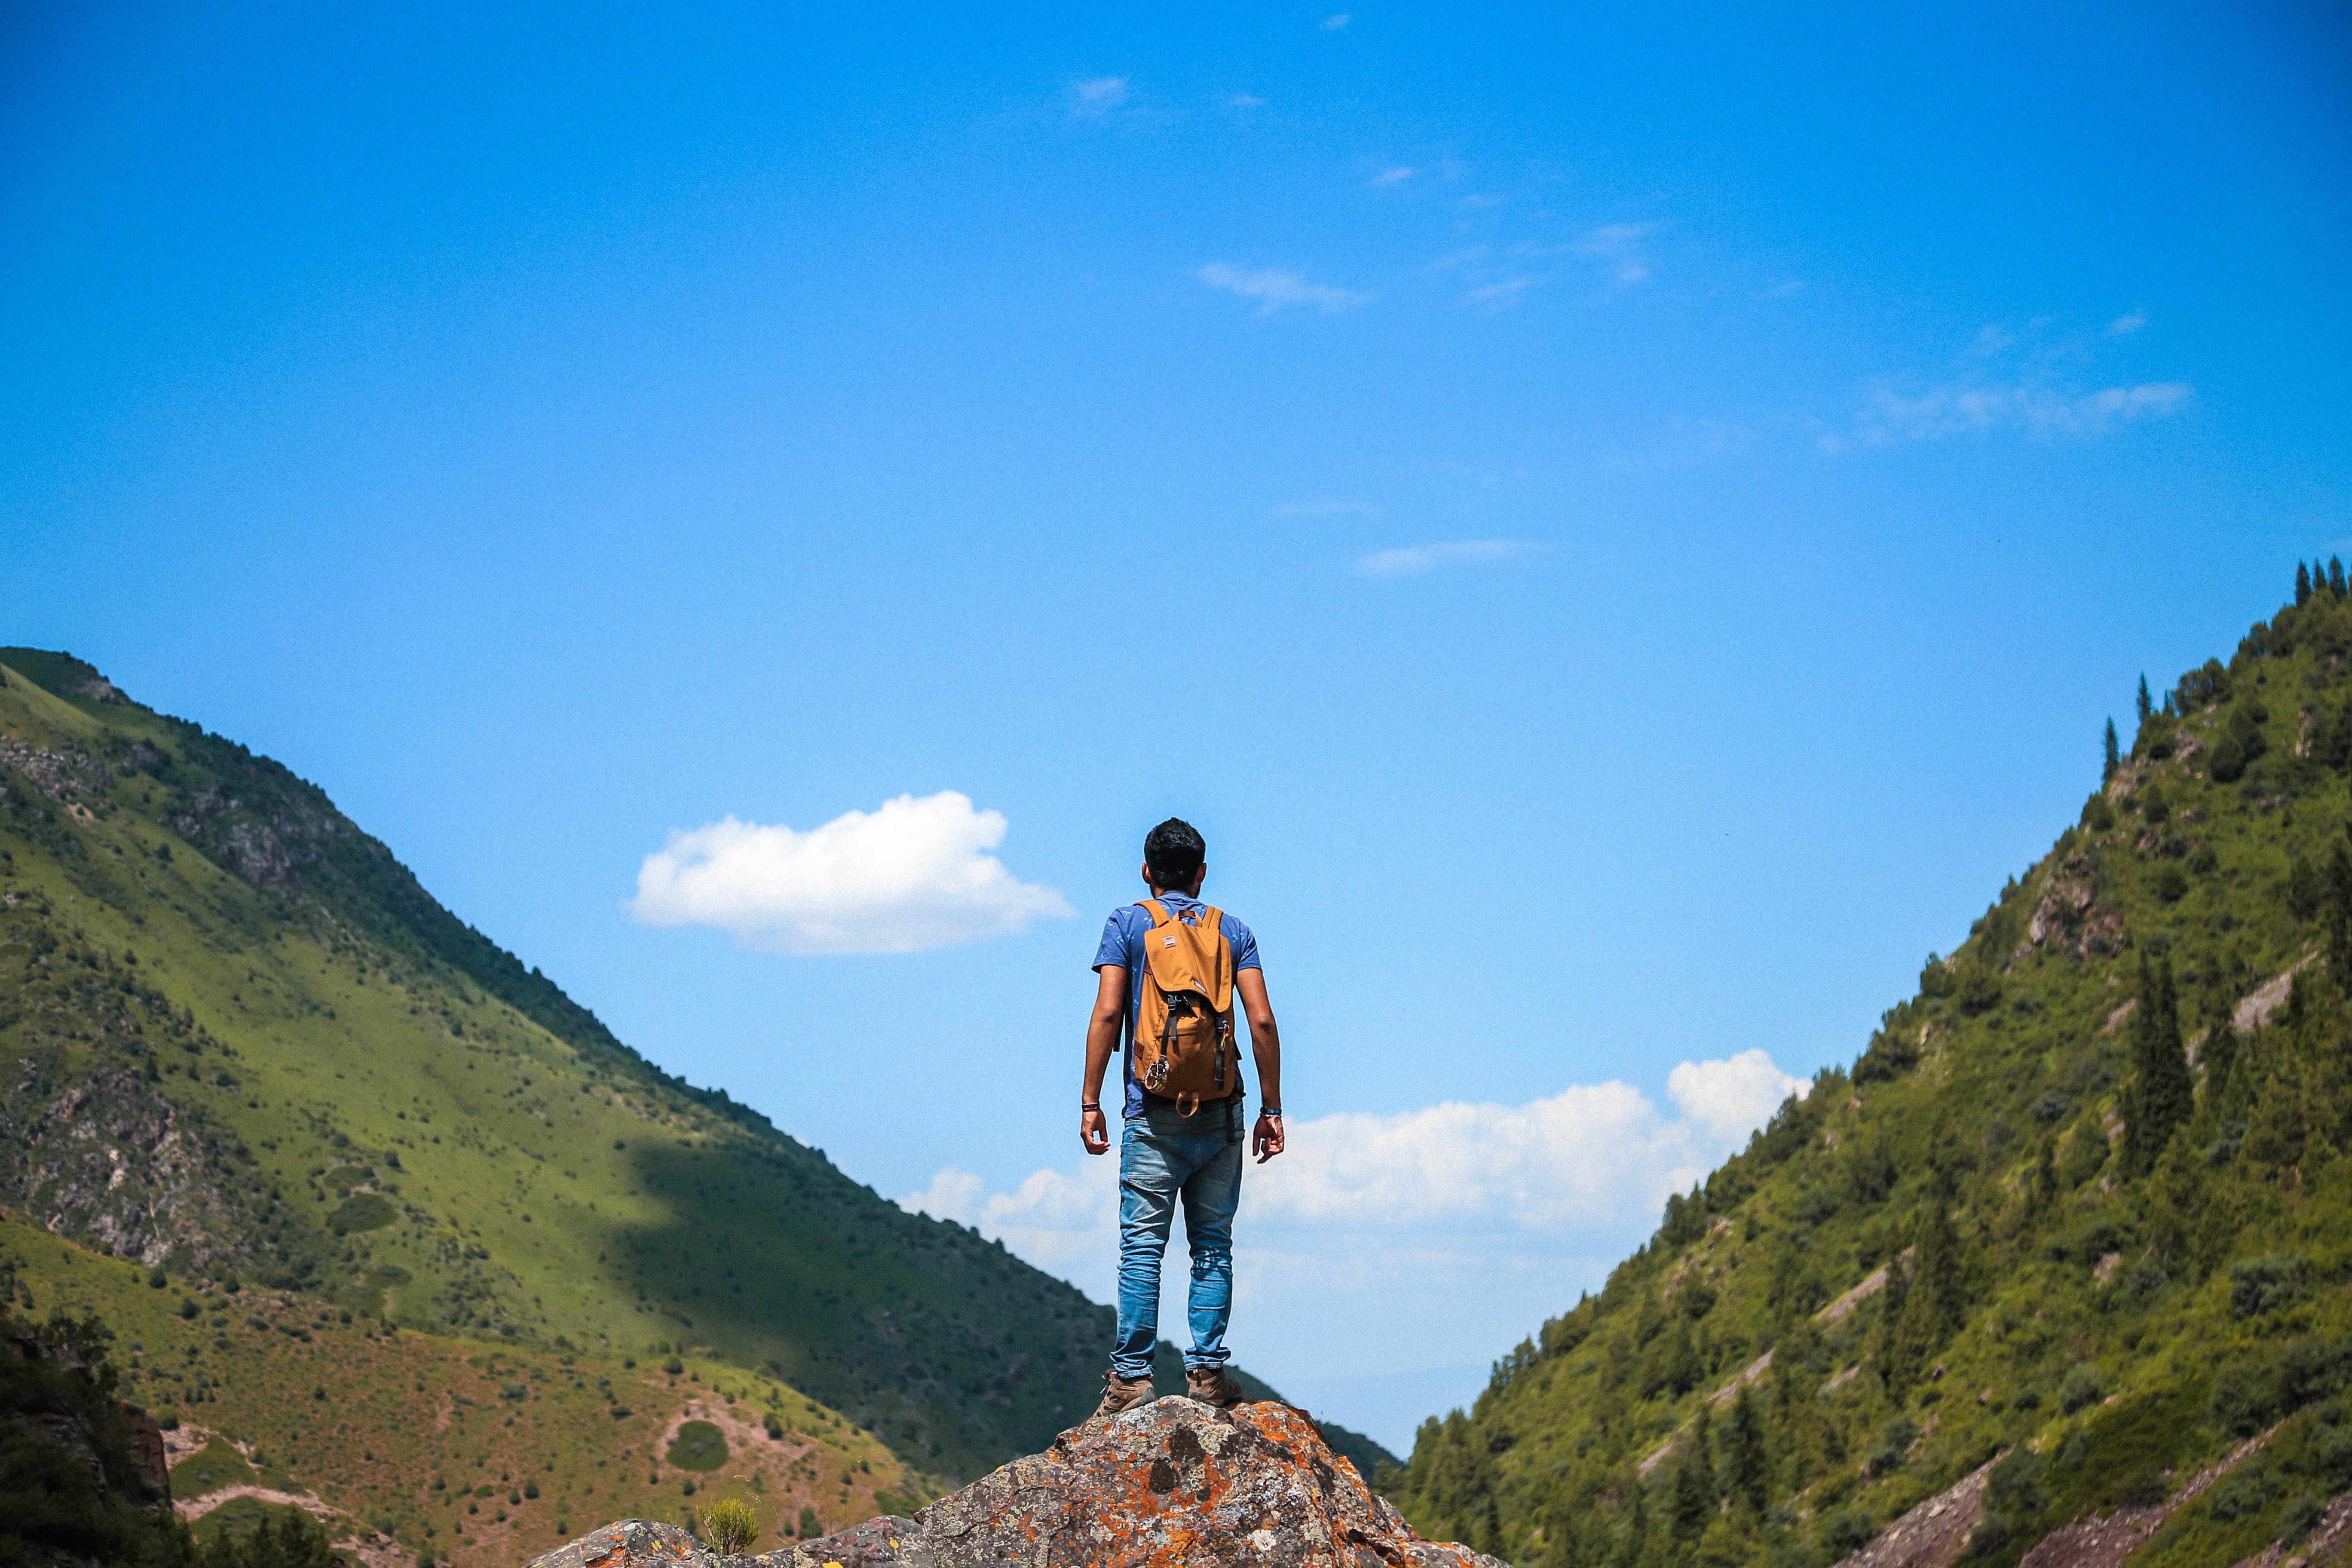 Man on Top of Mountain, Adventure, Man, Trees, Sky, HQ Photo